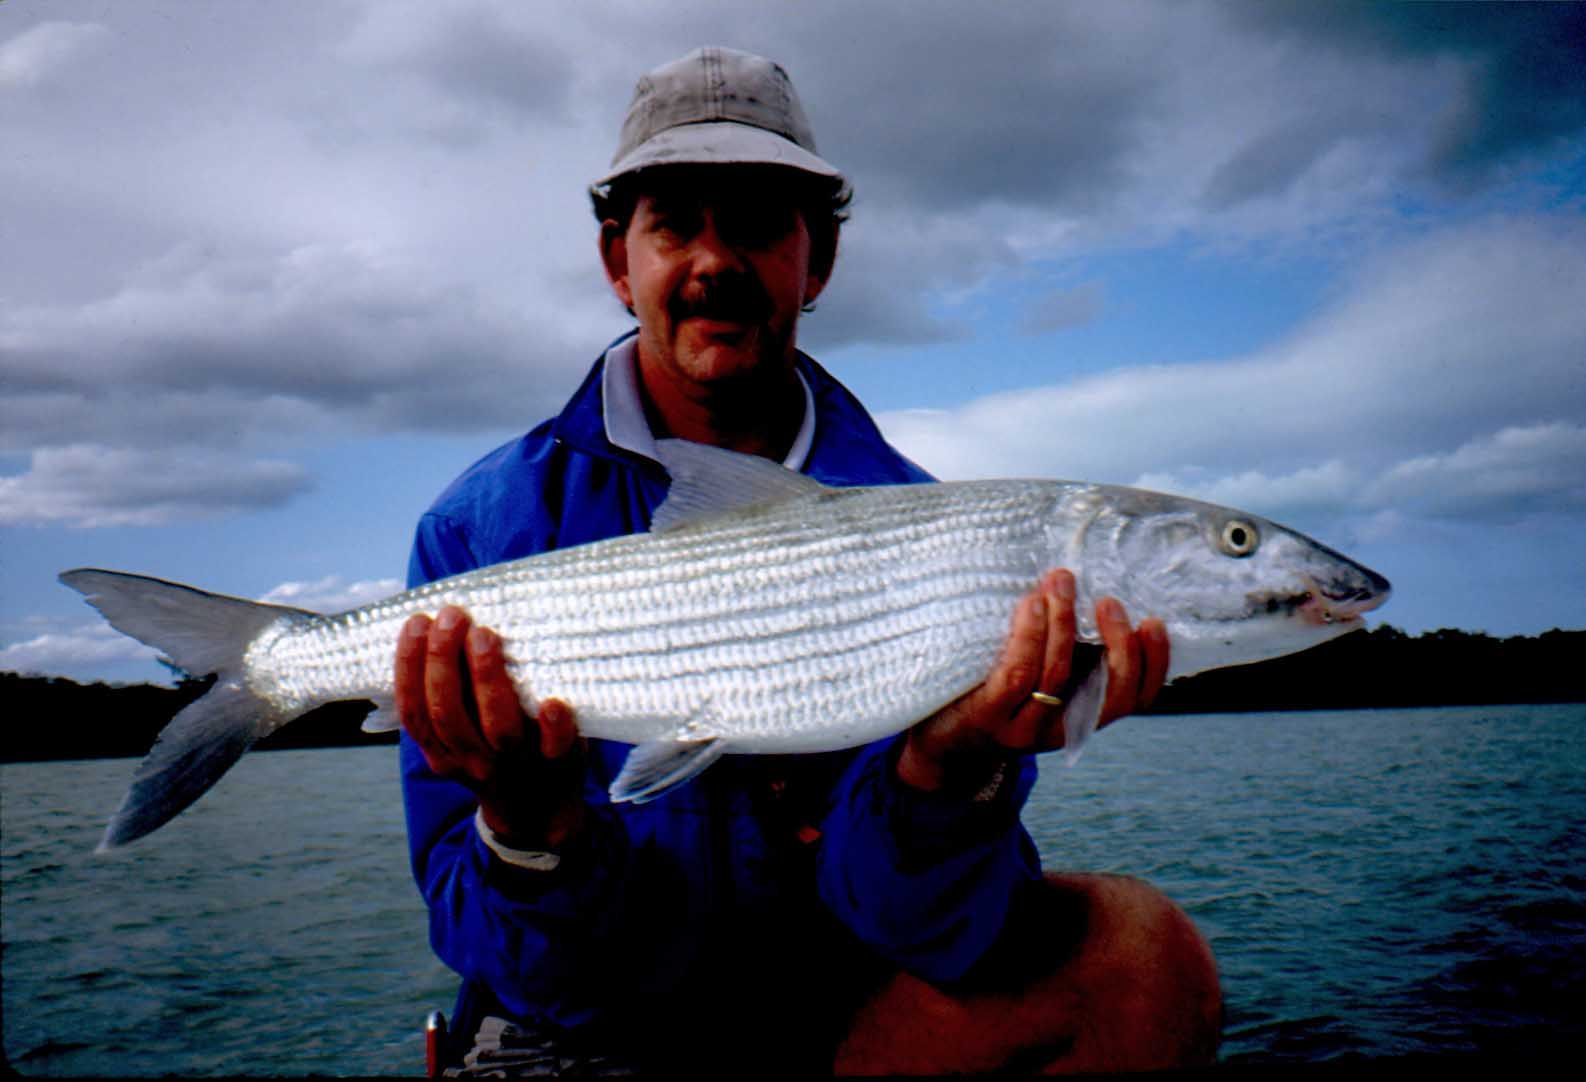 Chip Bates with a nice 12 pound Bahamas Bonefish